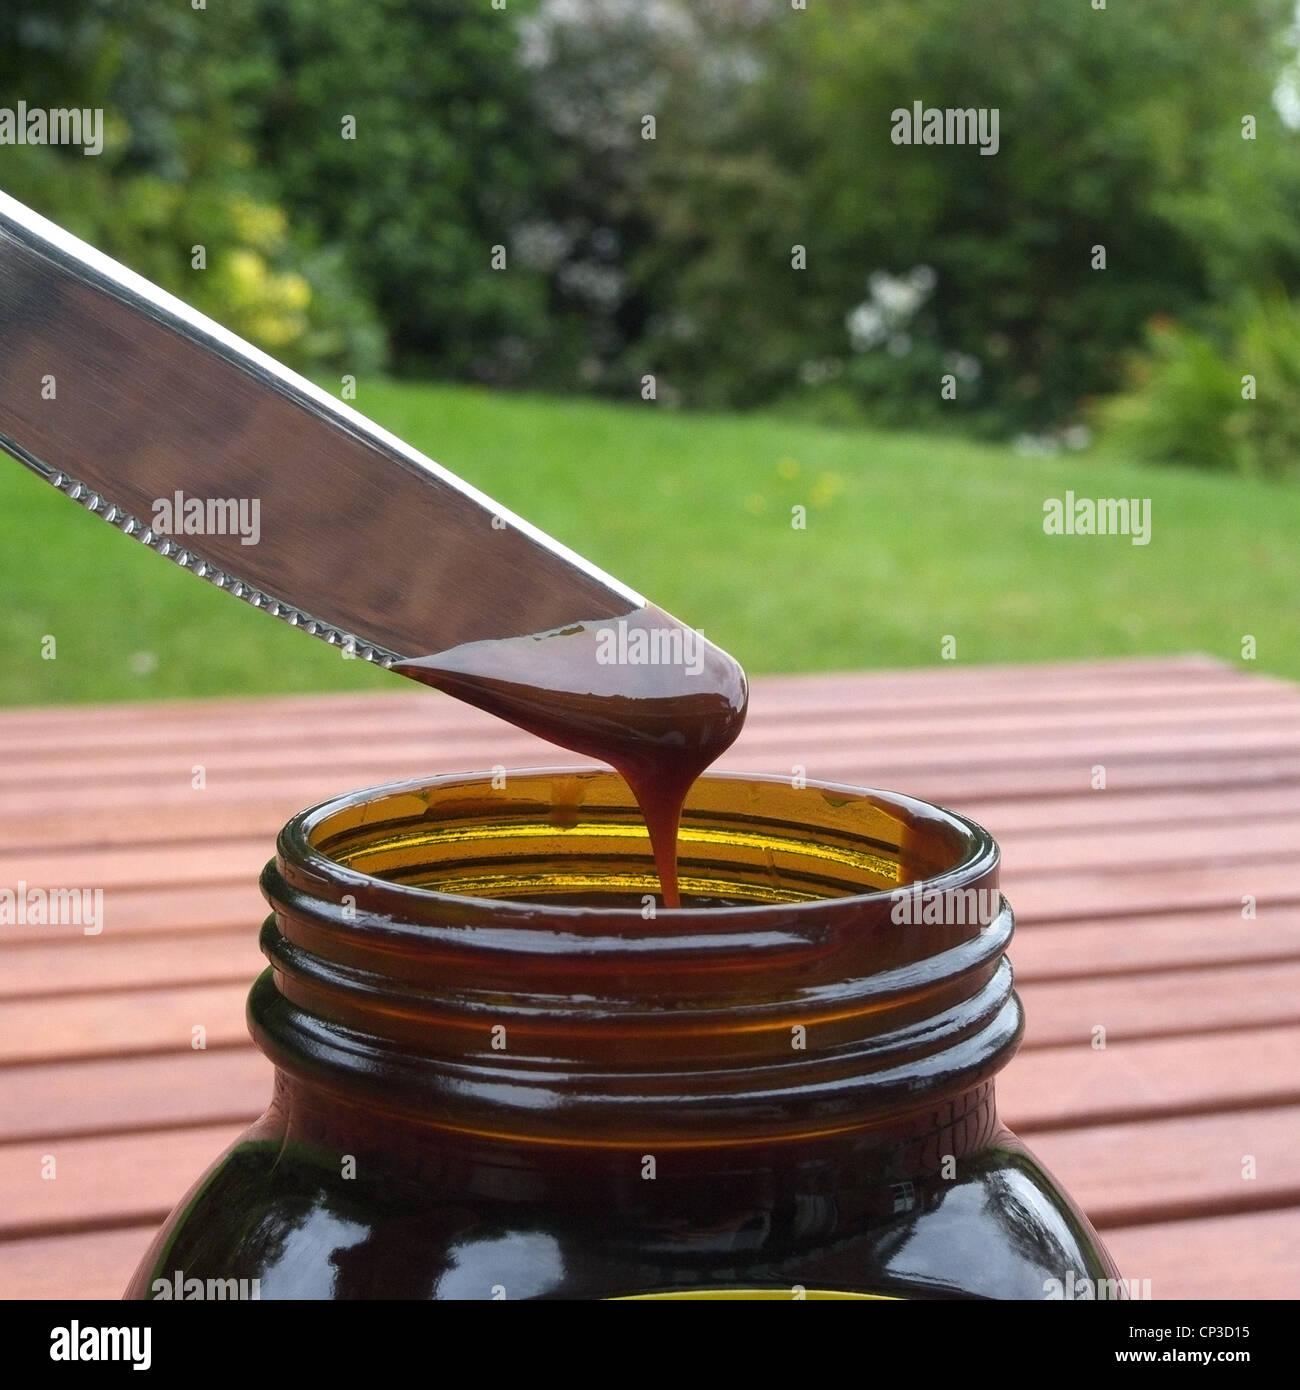 Marmite or Vegemite on a Knife - Stock Image